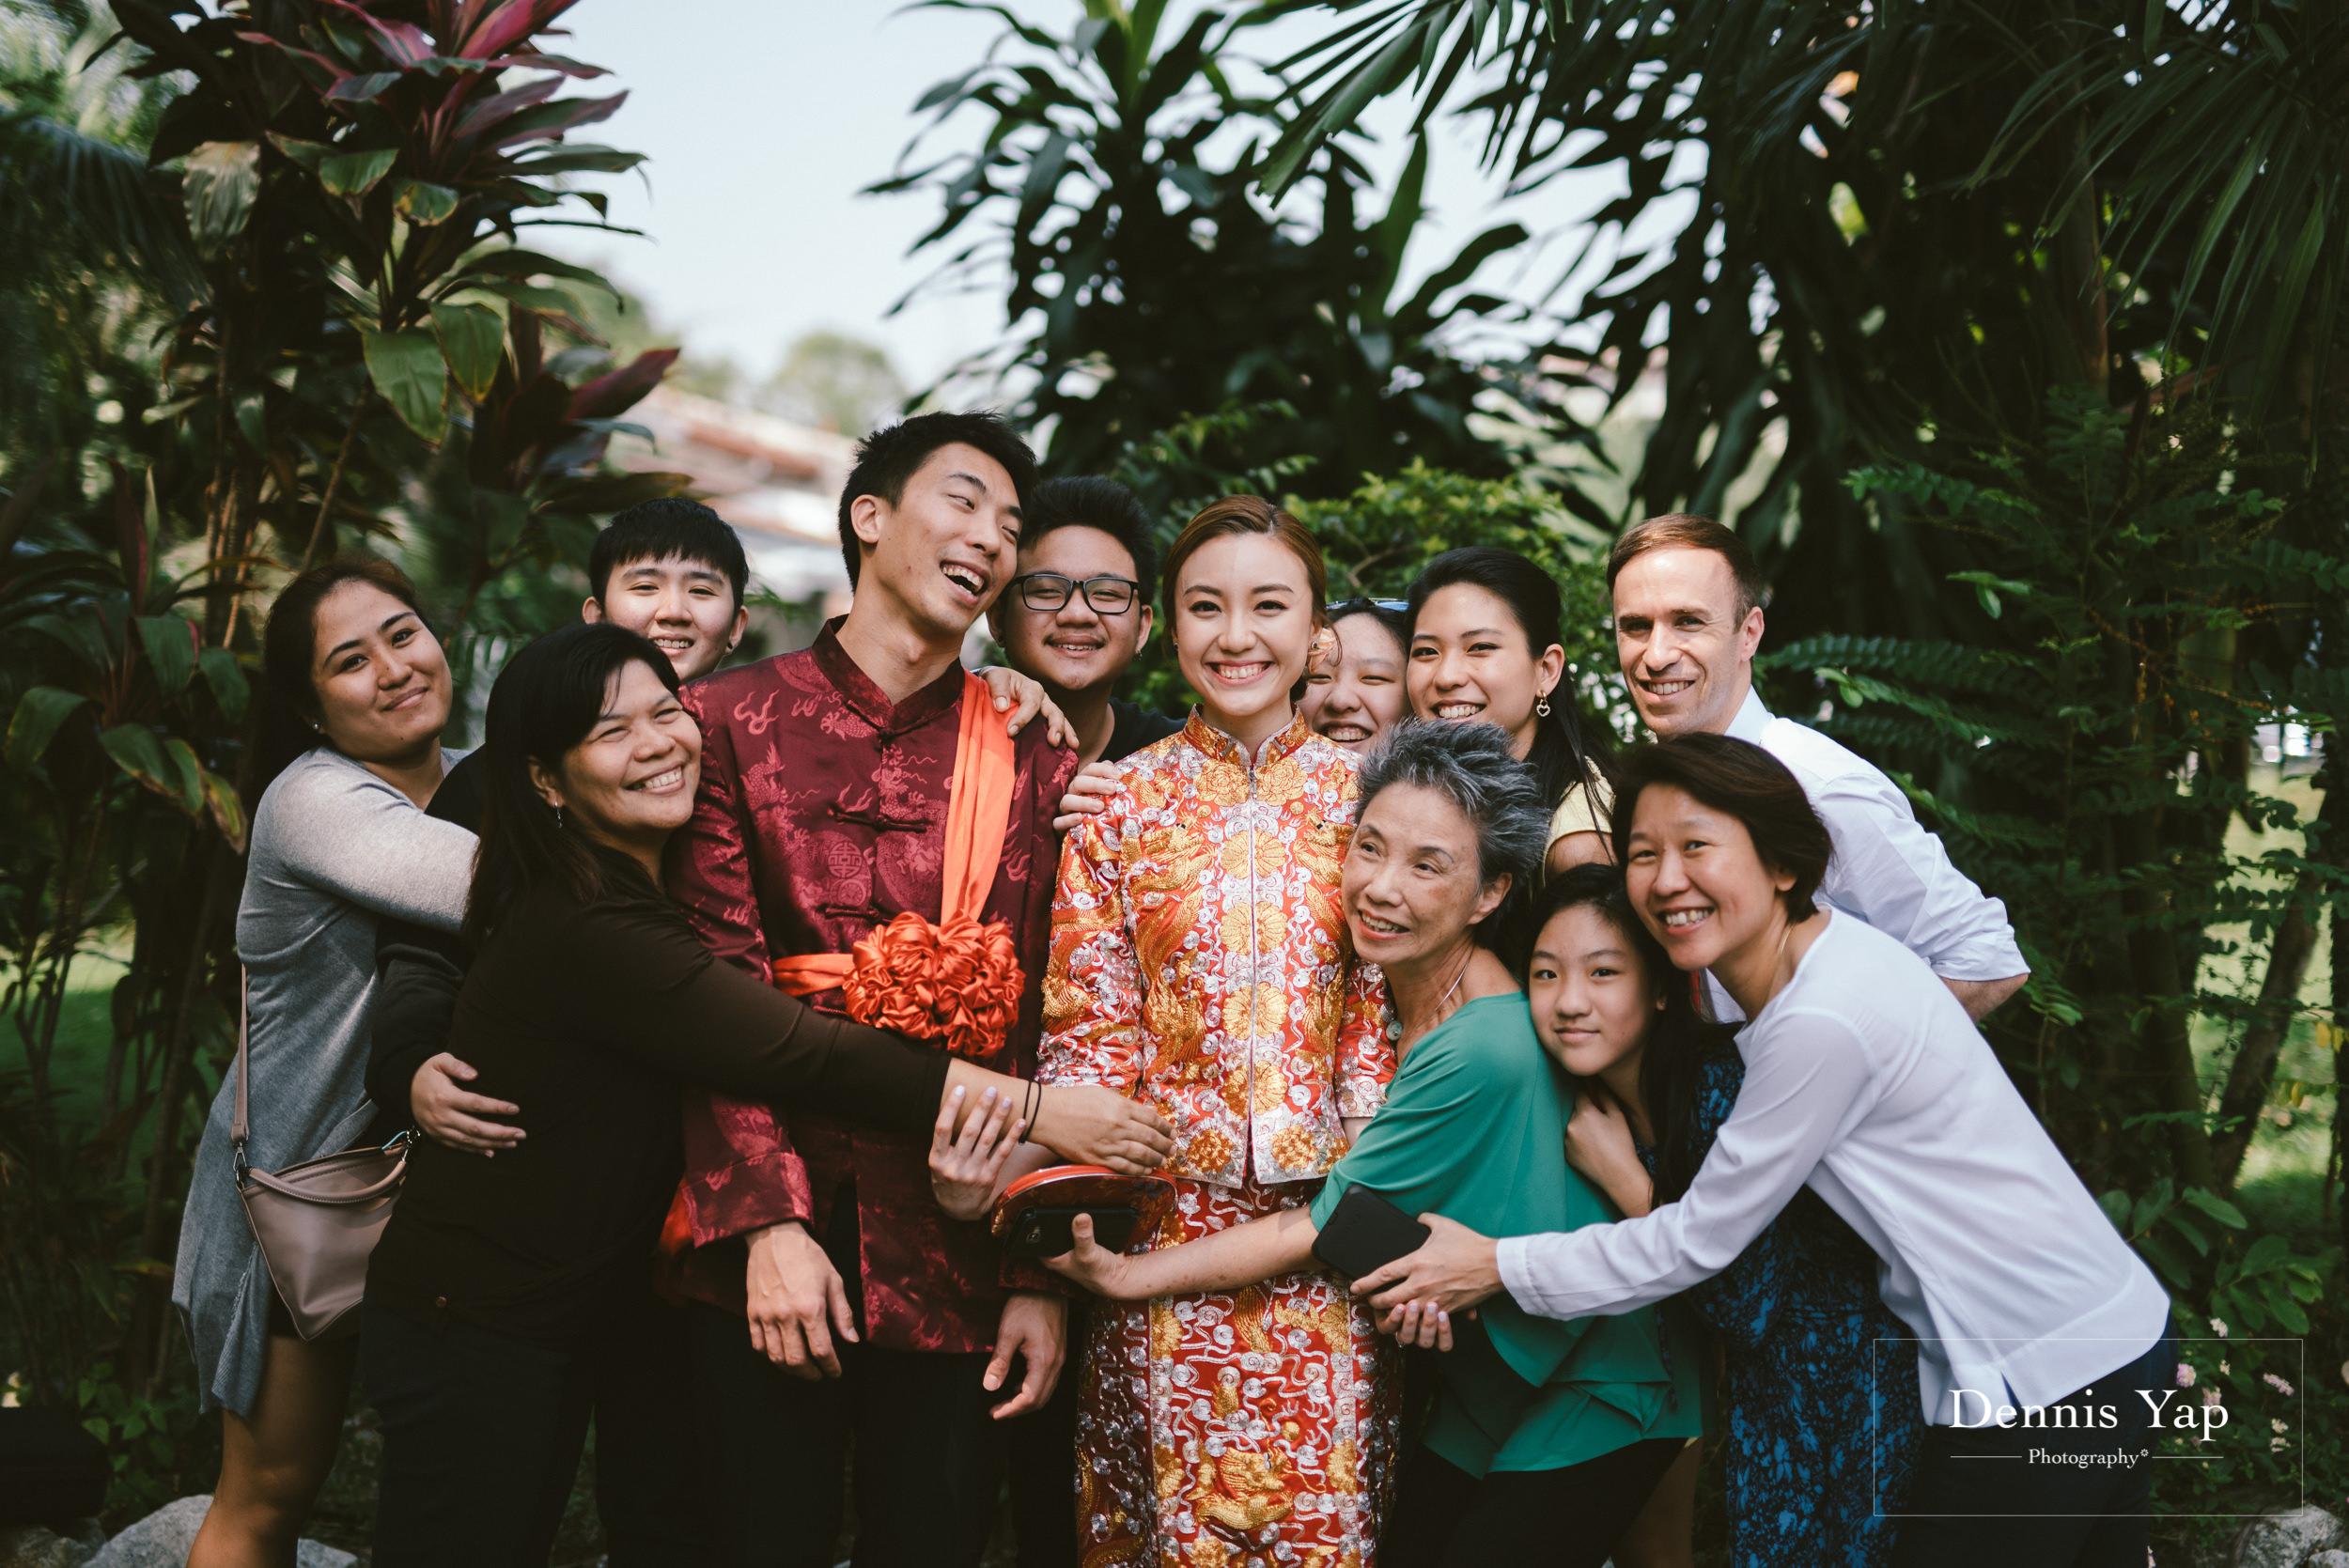 justin hsin wedding day ciao ristorante kuala lumpur dennis yap photography-20.jpg